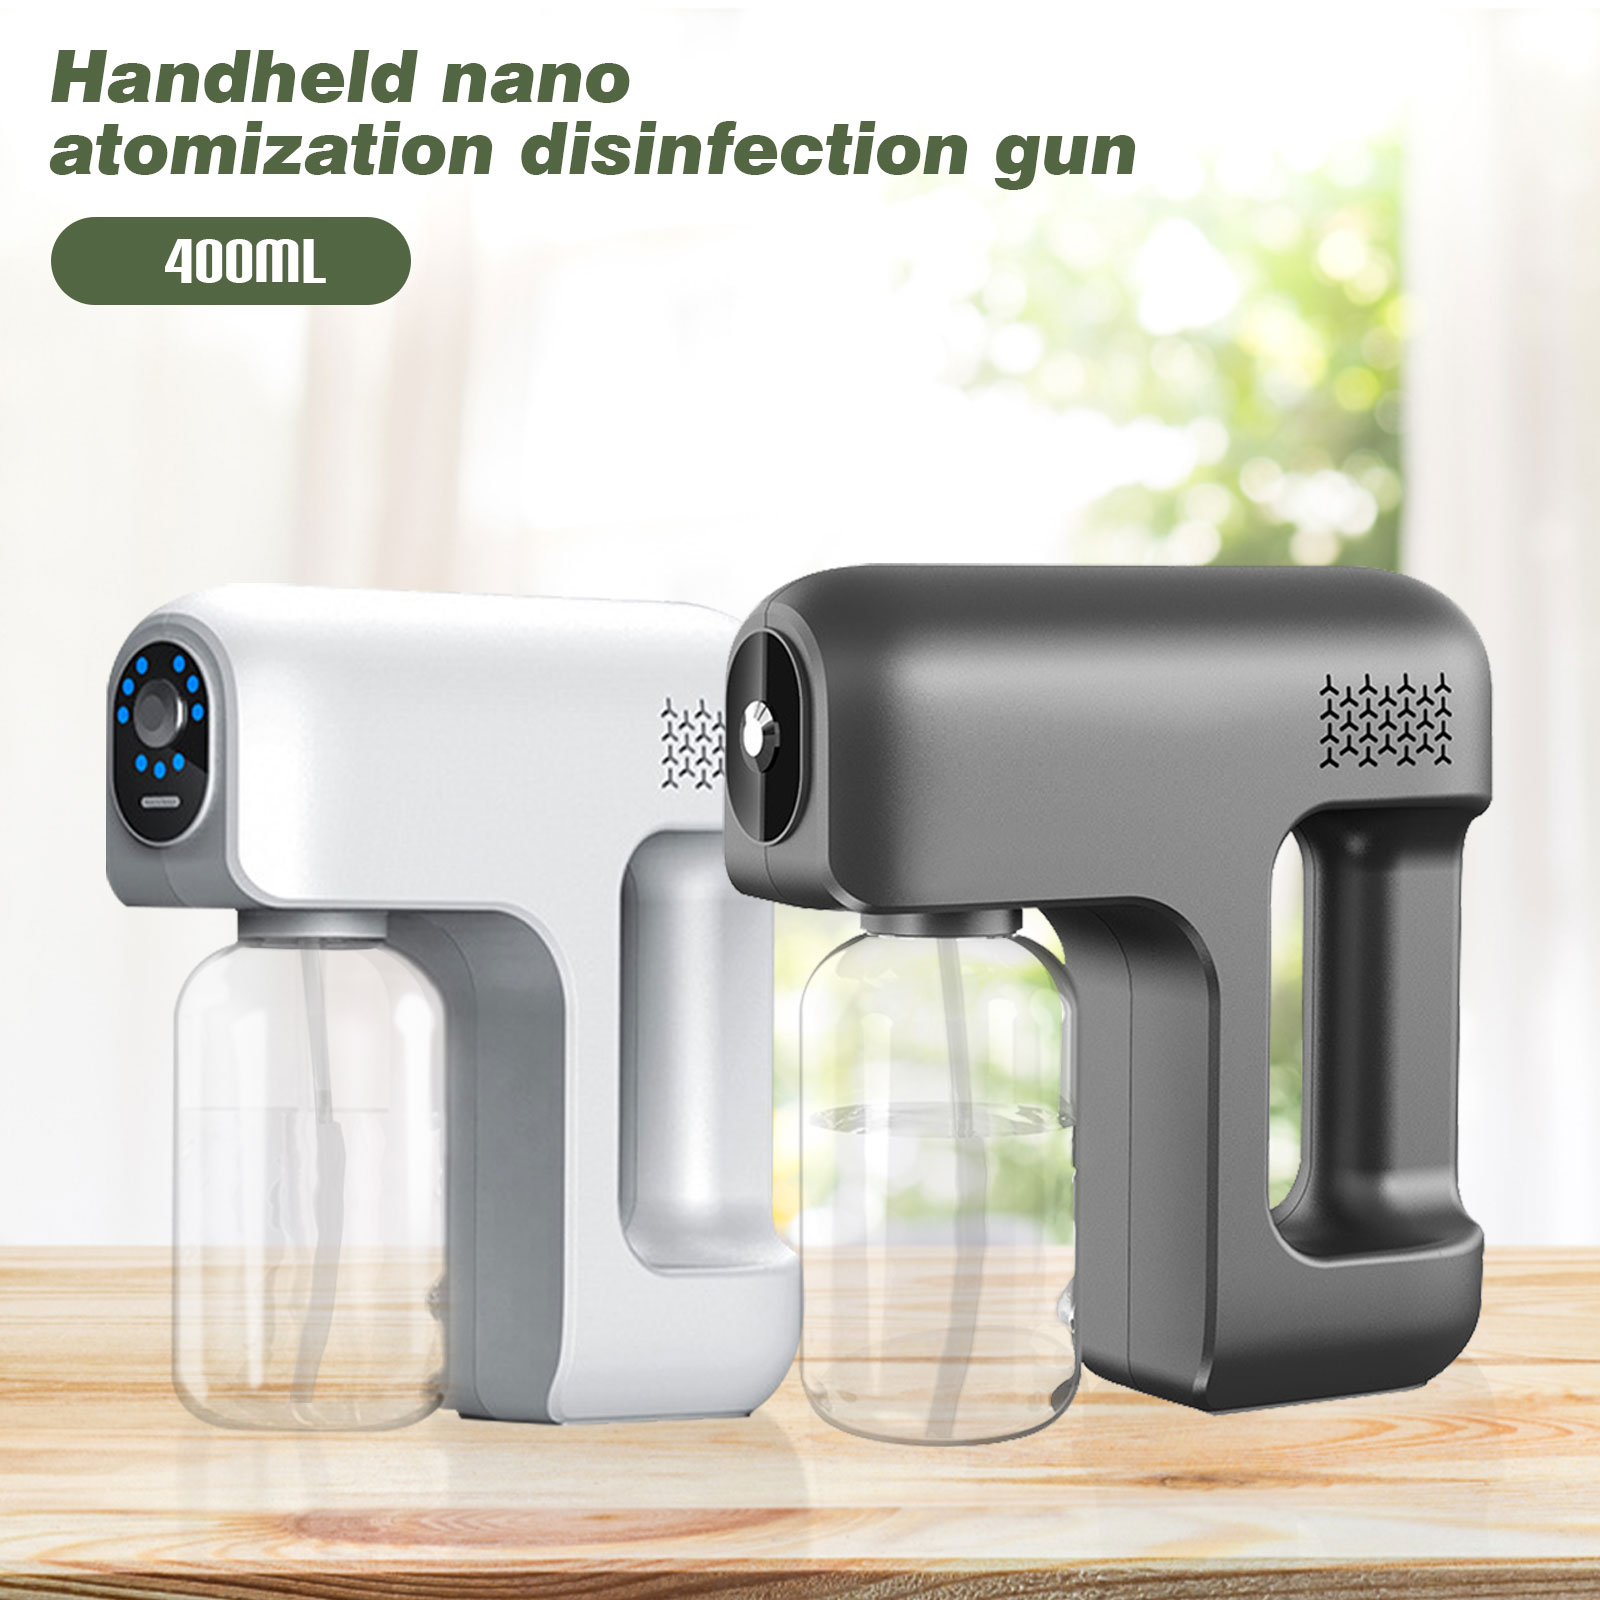 2600mAh Spray Gun Fogger Machine Portable Cordless Steam Atomizing Sprays Nano Disinfecting Sprayer Gun for Home Hotel Car